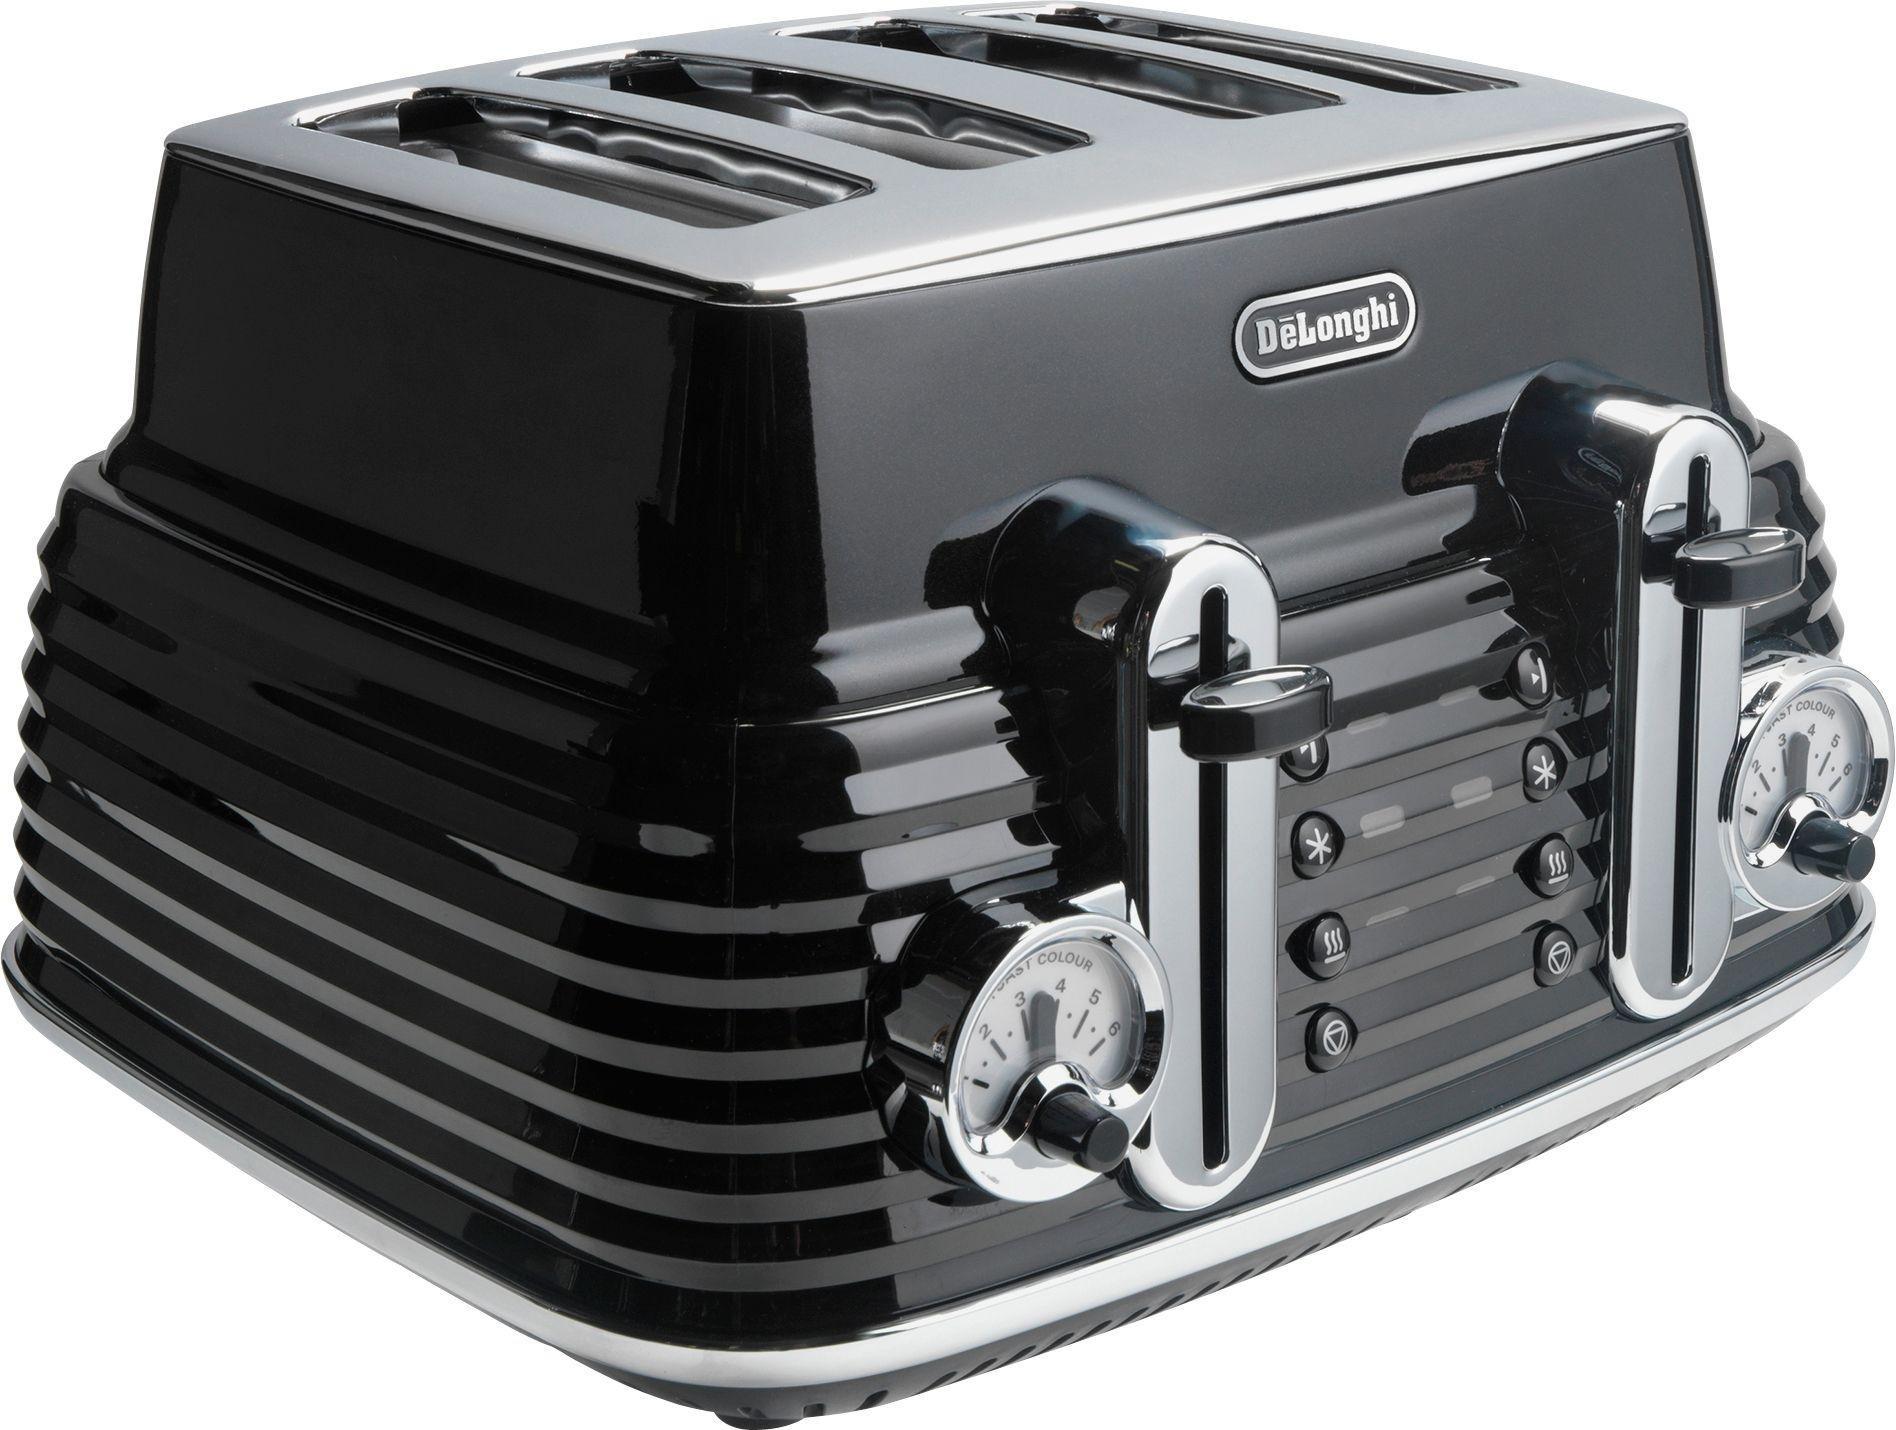 DeLonghi - Toaster - 4 Slice Scultura Toaster - -Black